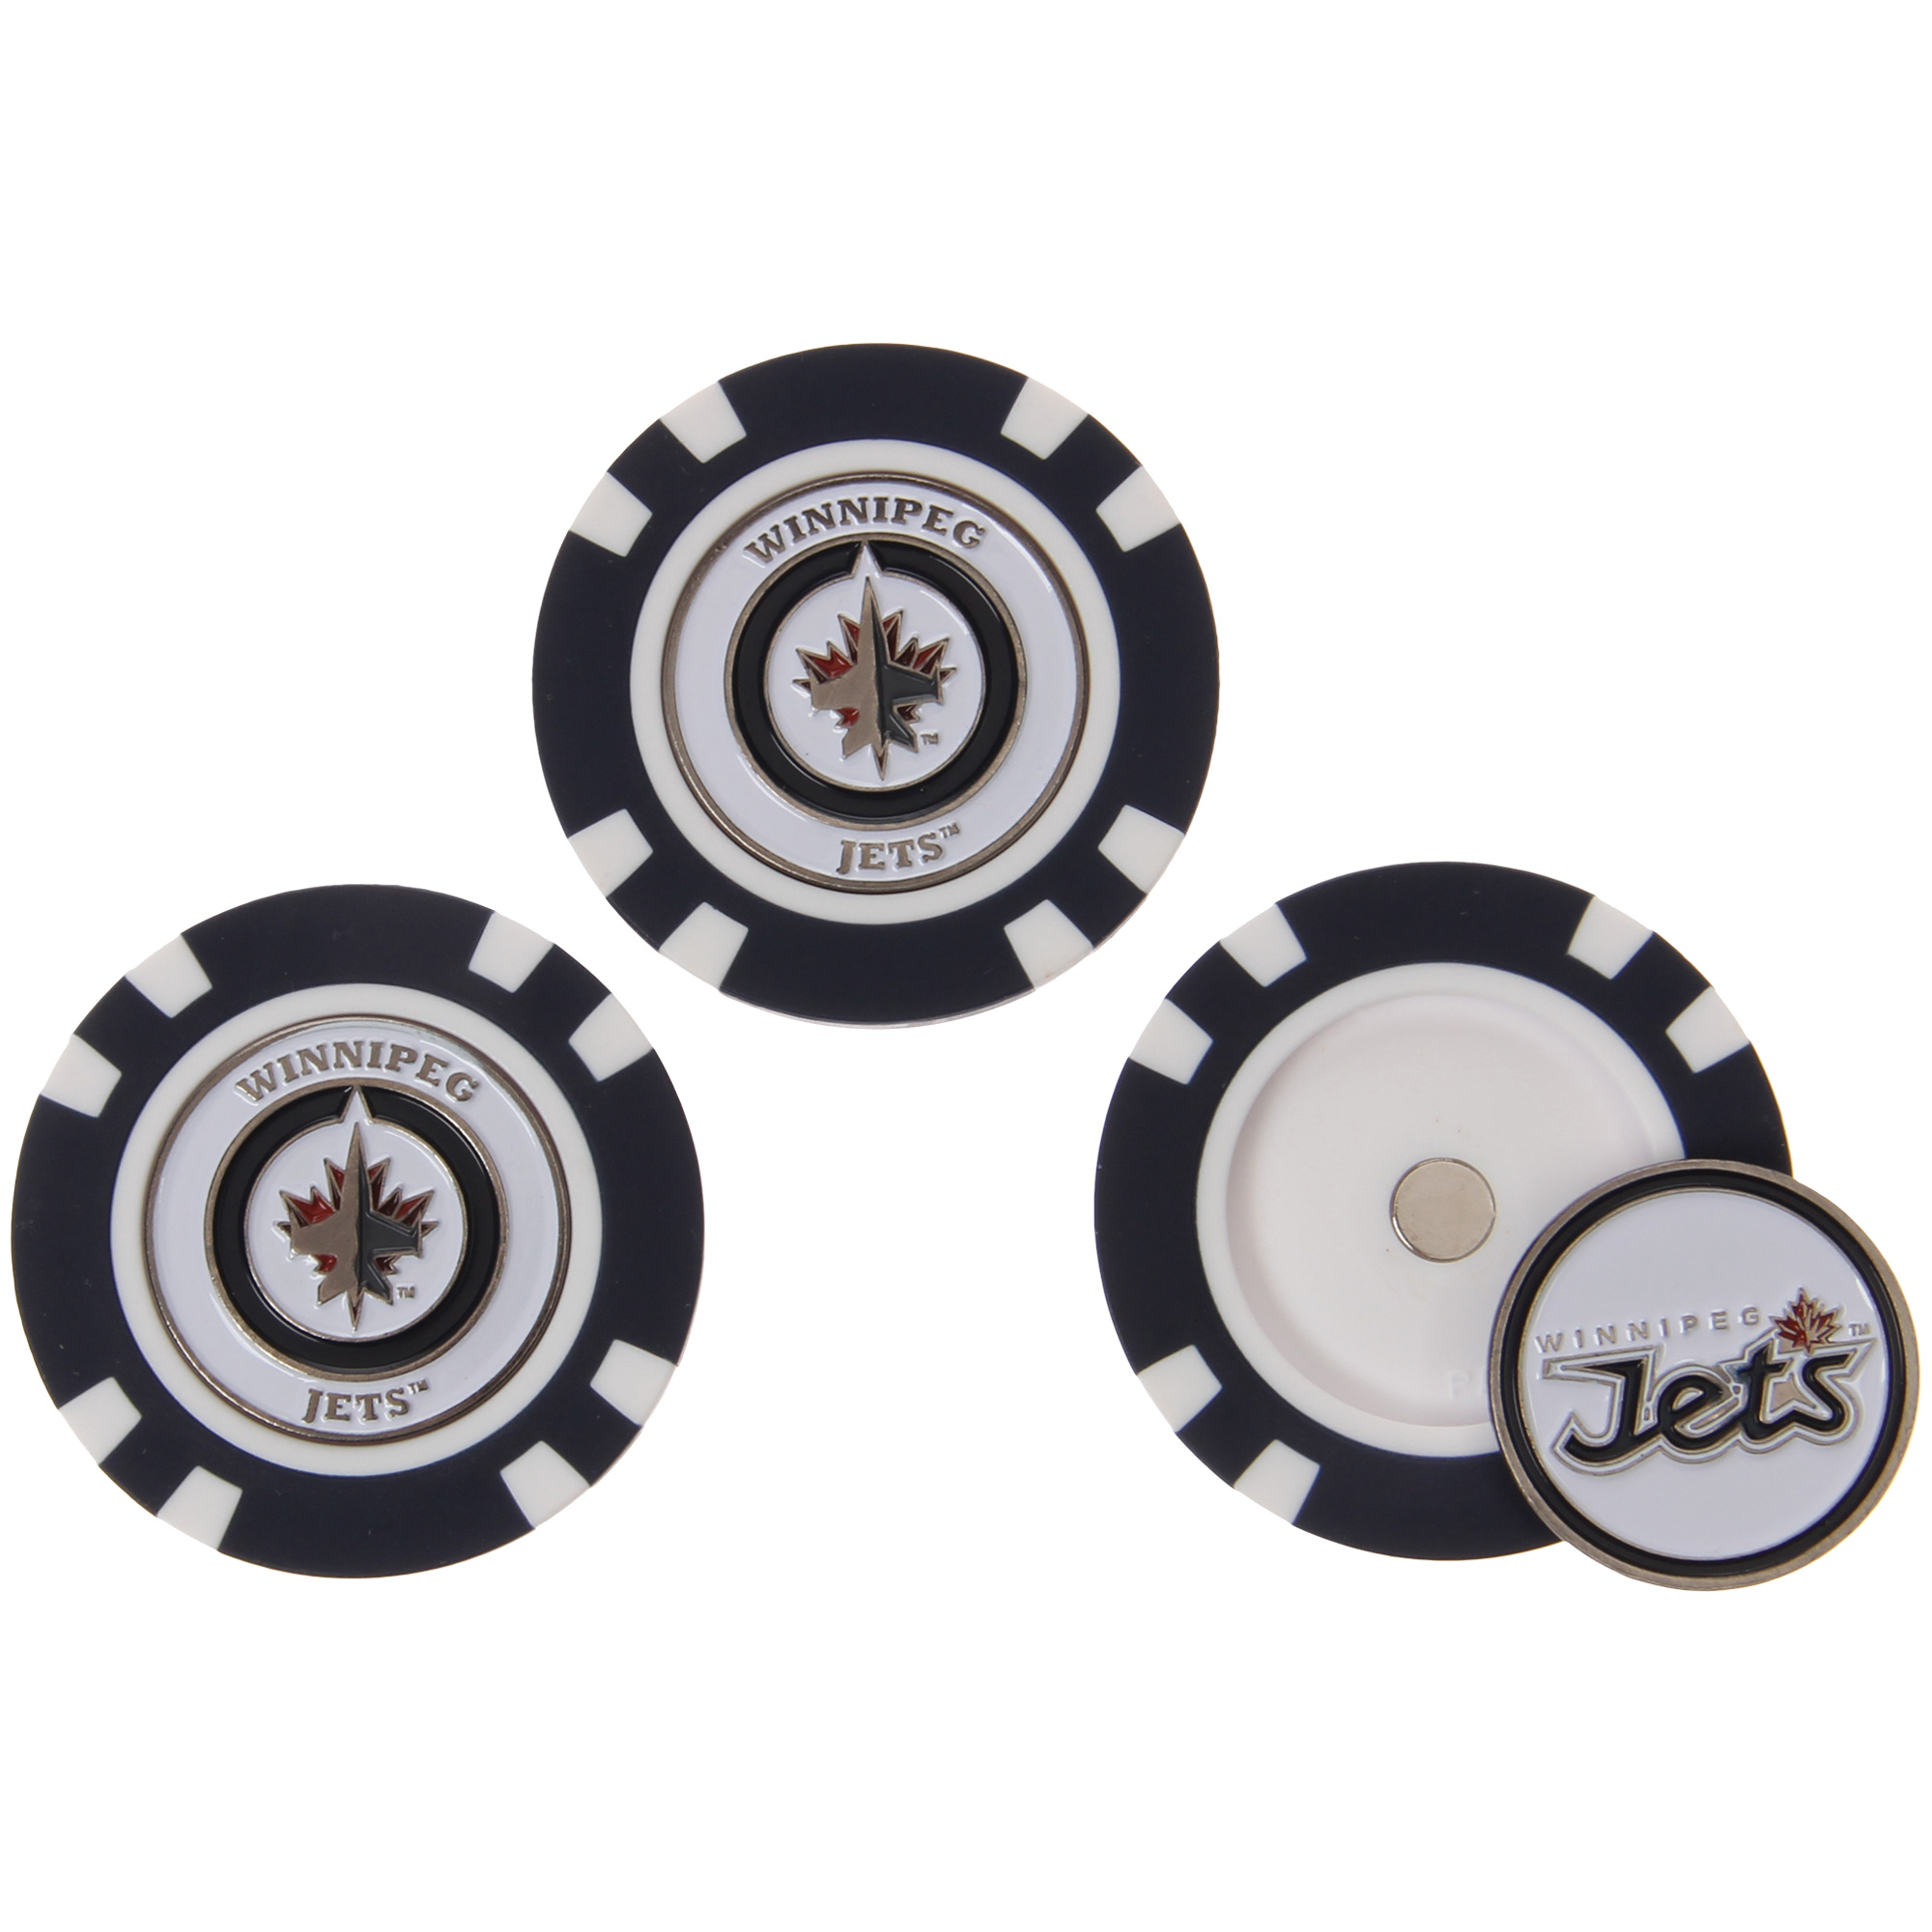 Winnipeg Jets 3-Pack Poker Chip Golf Ball Markers - No Size